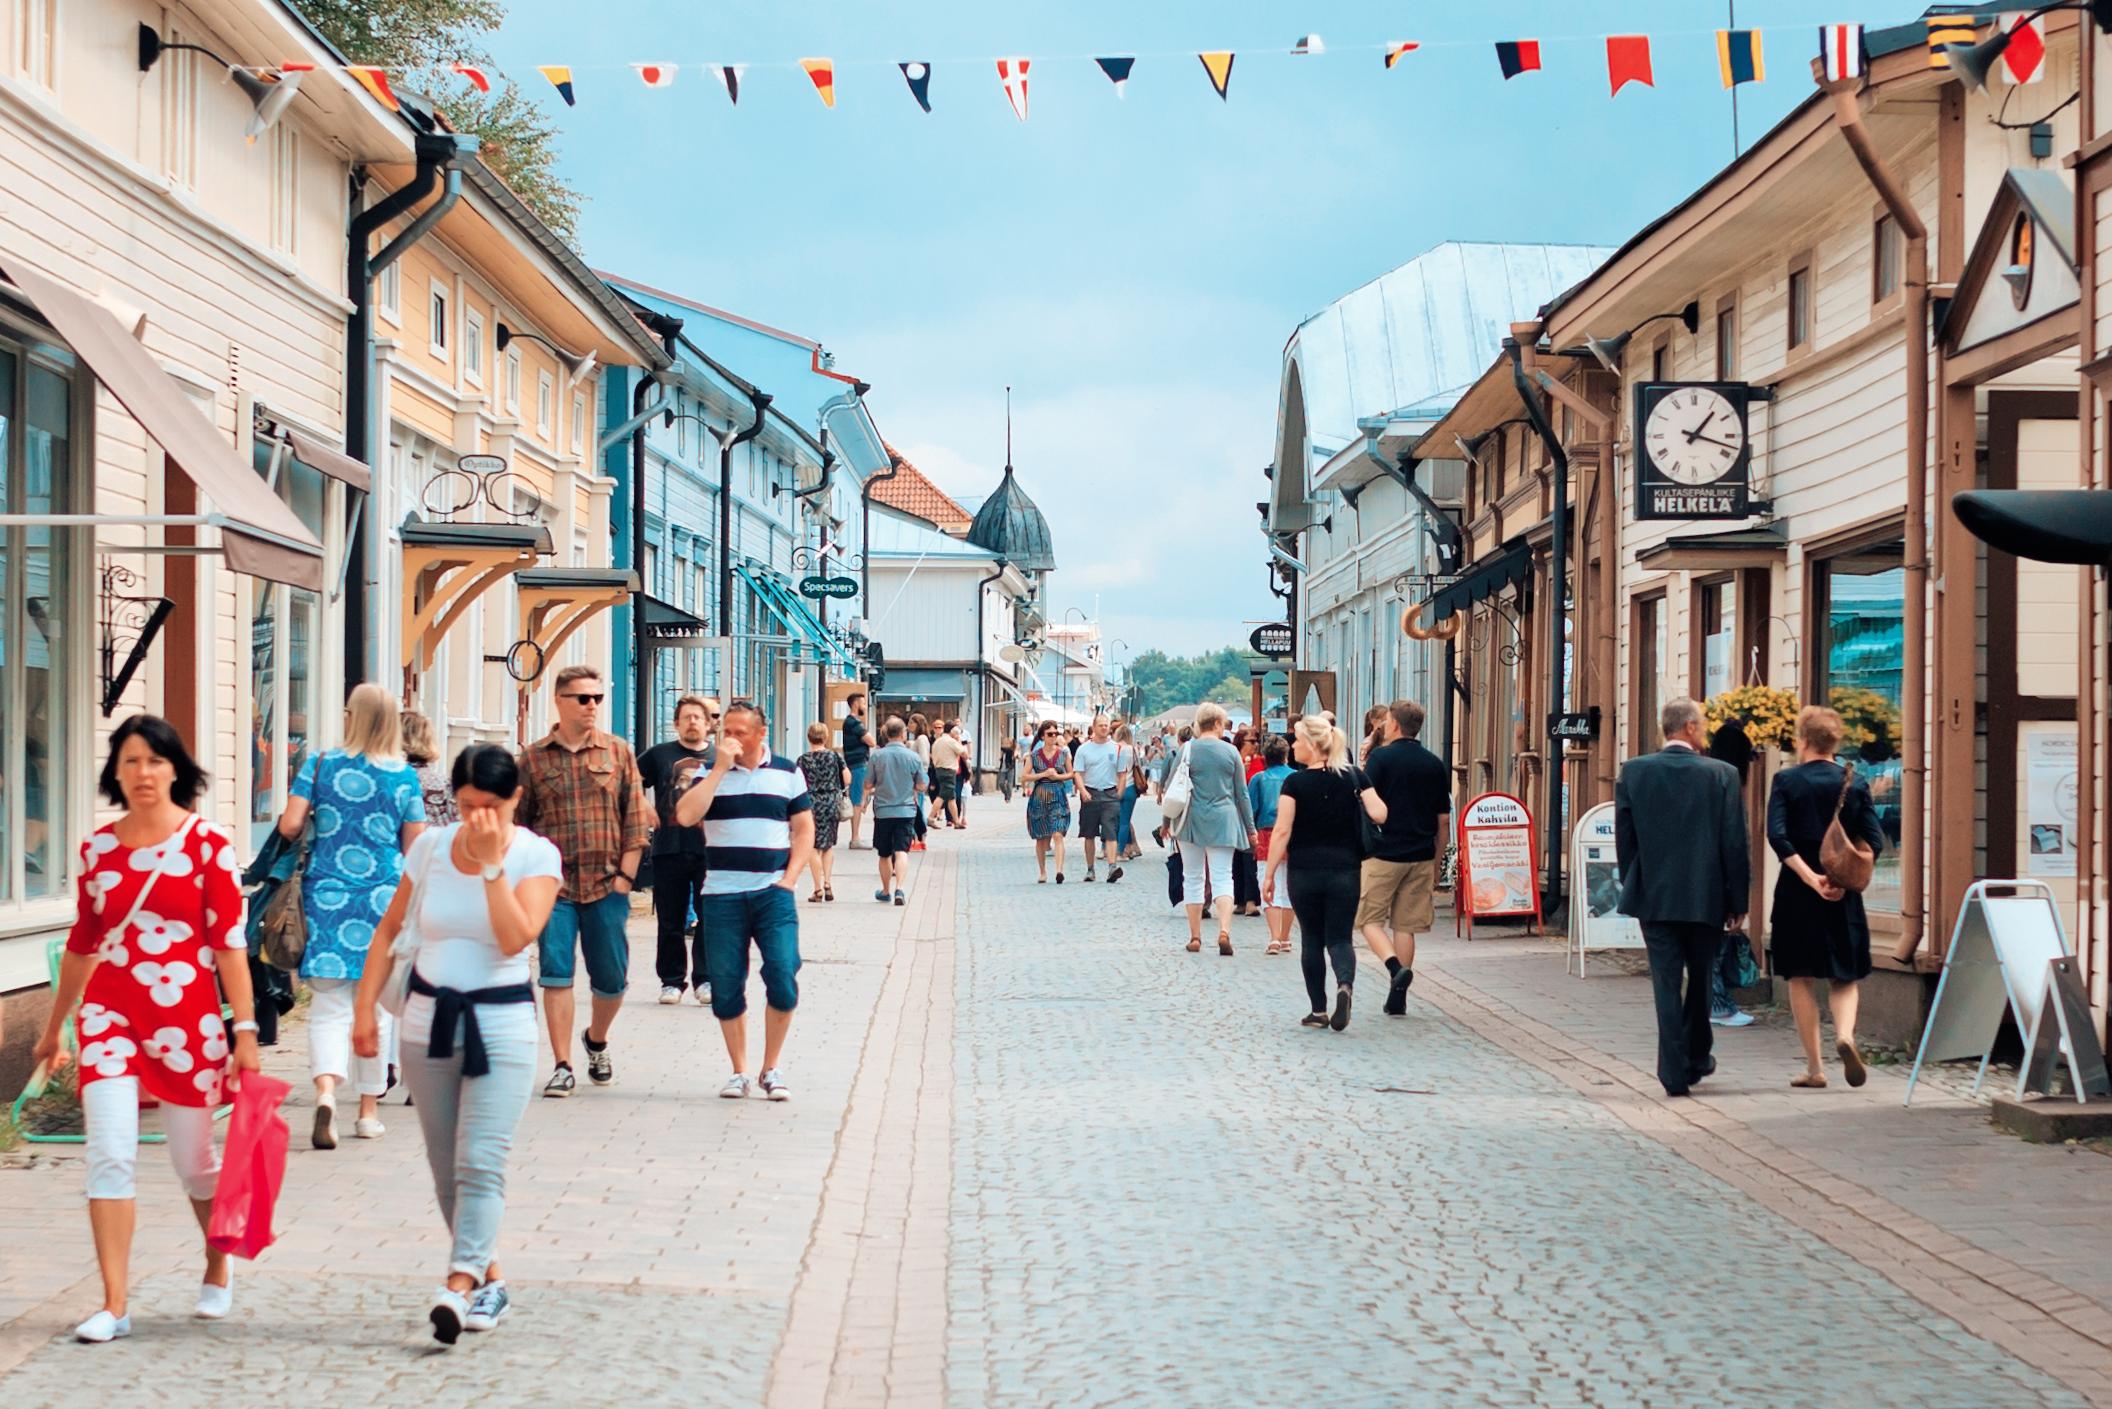 Old Rauma_kuninkaankatu_city of Rauma - Finland